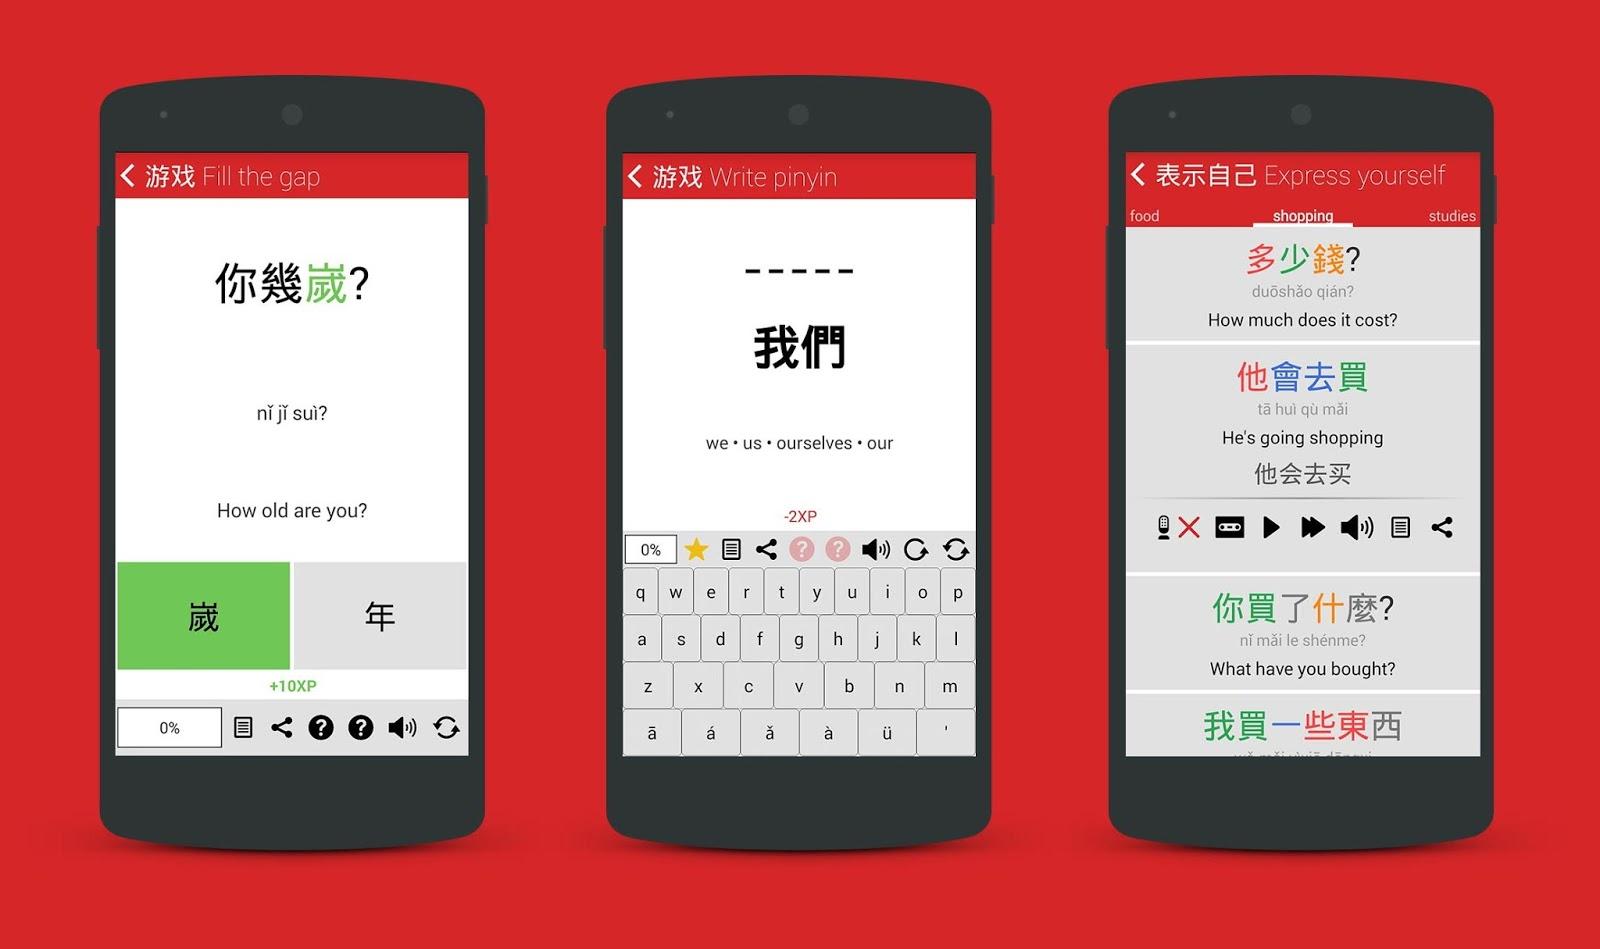 Chinese HSK app update